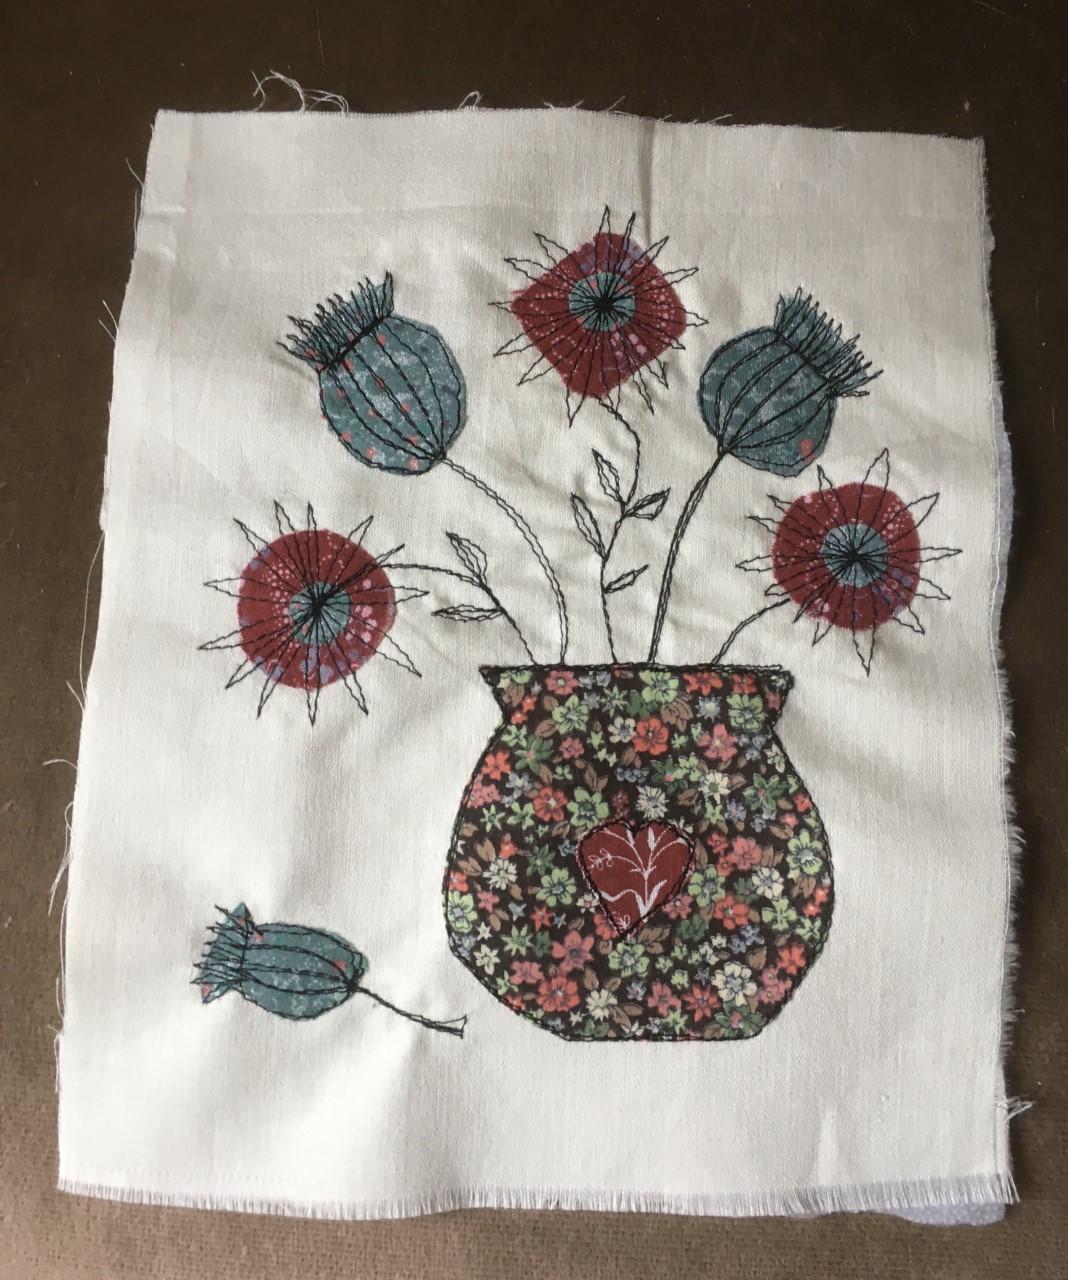 Embroidery via Zoom